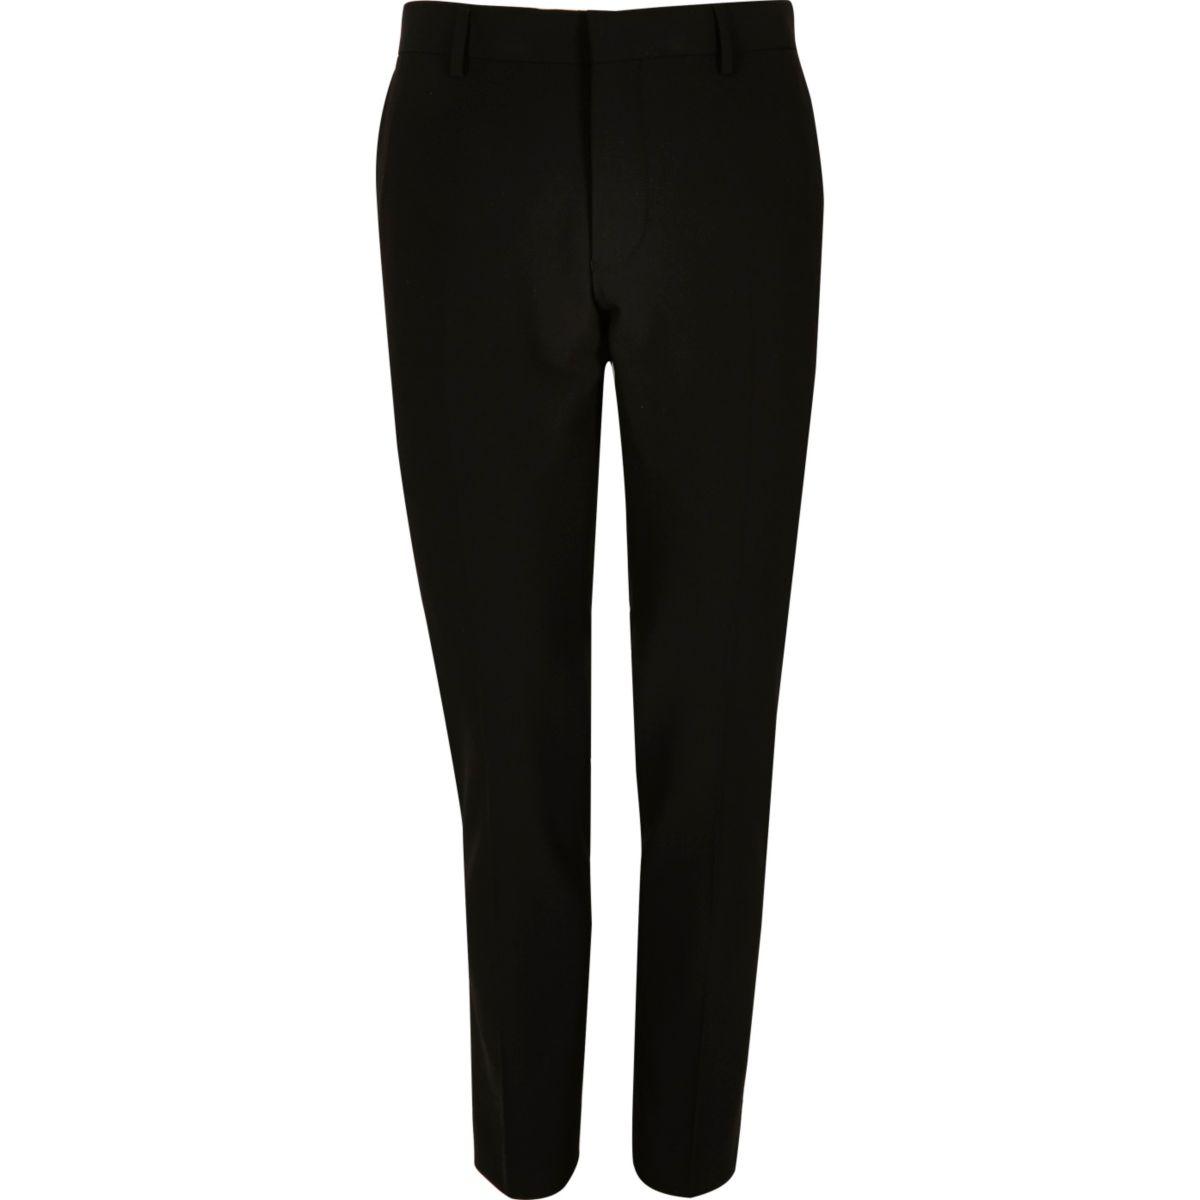 Pantalon de costume ultra skinny noir